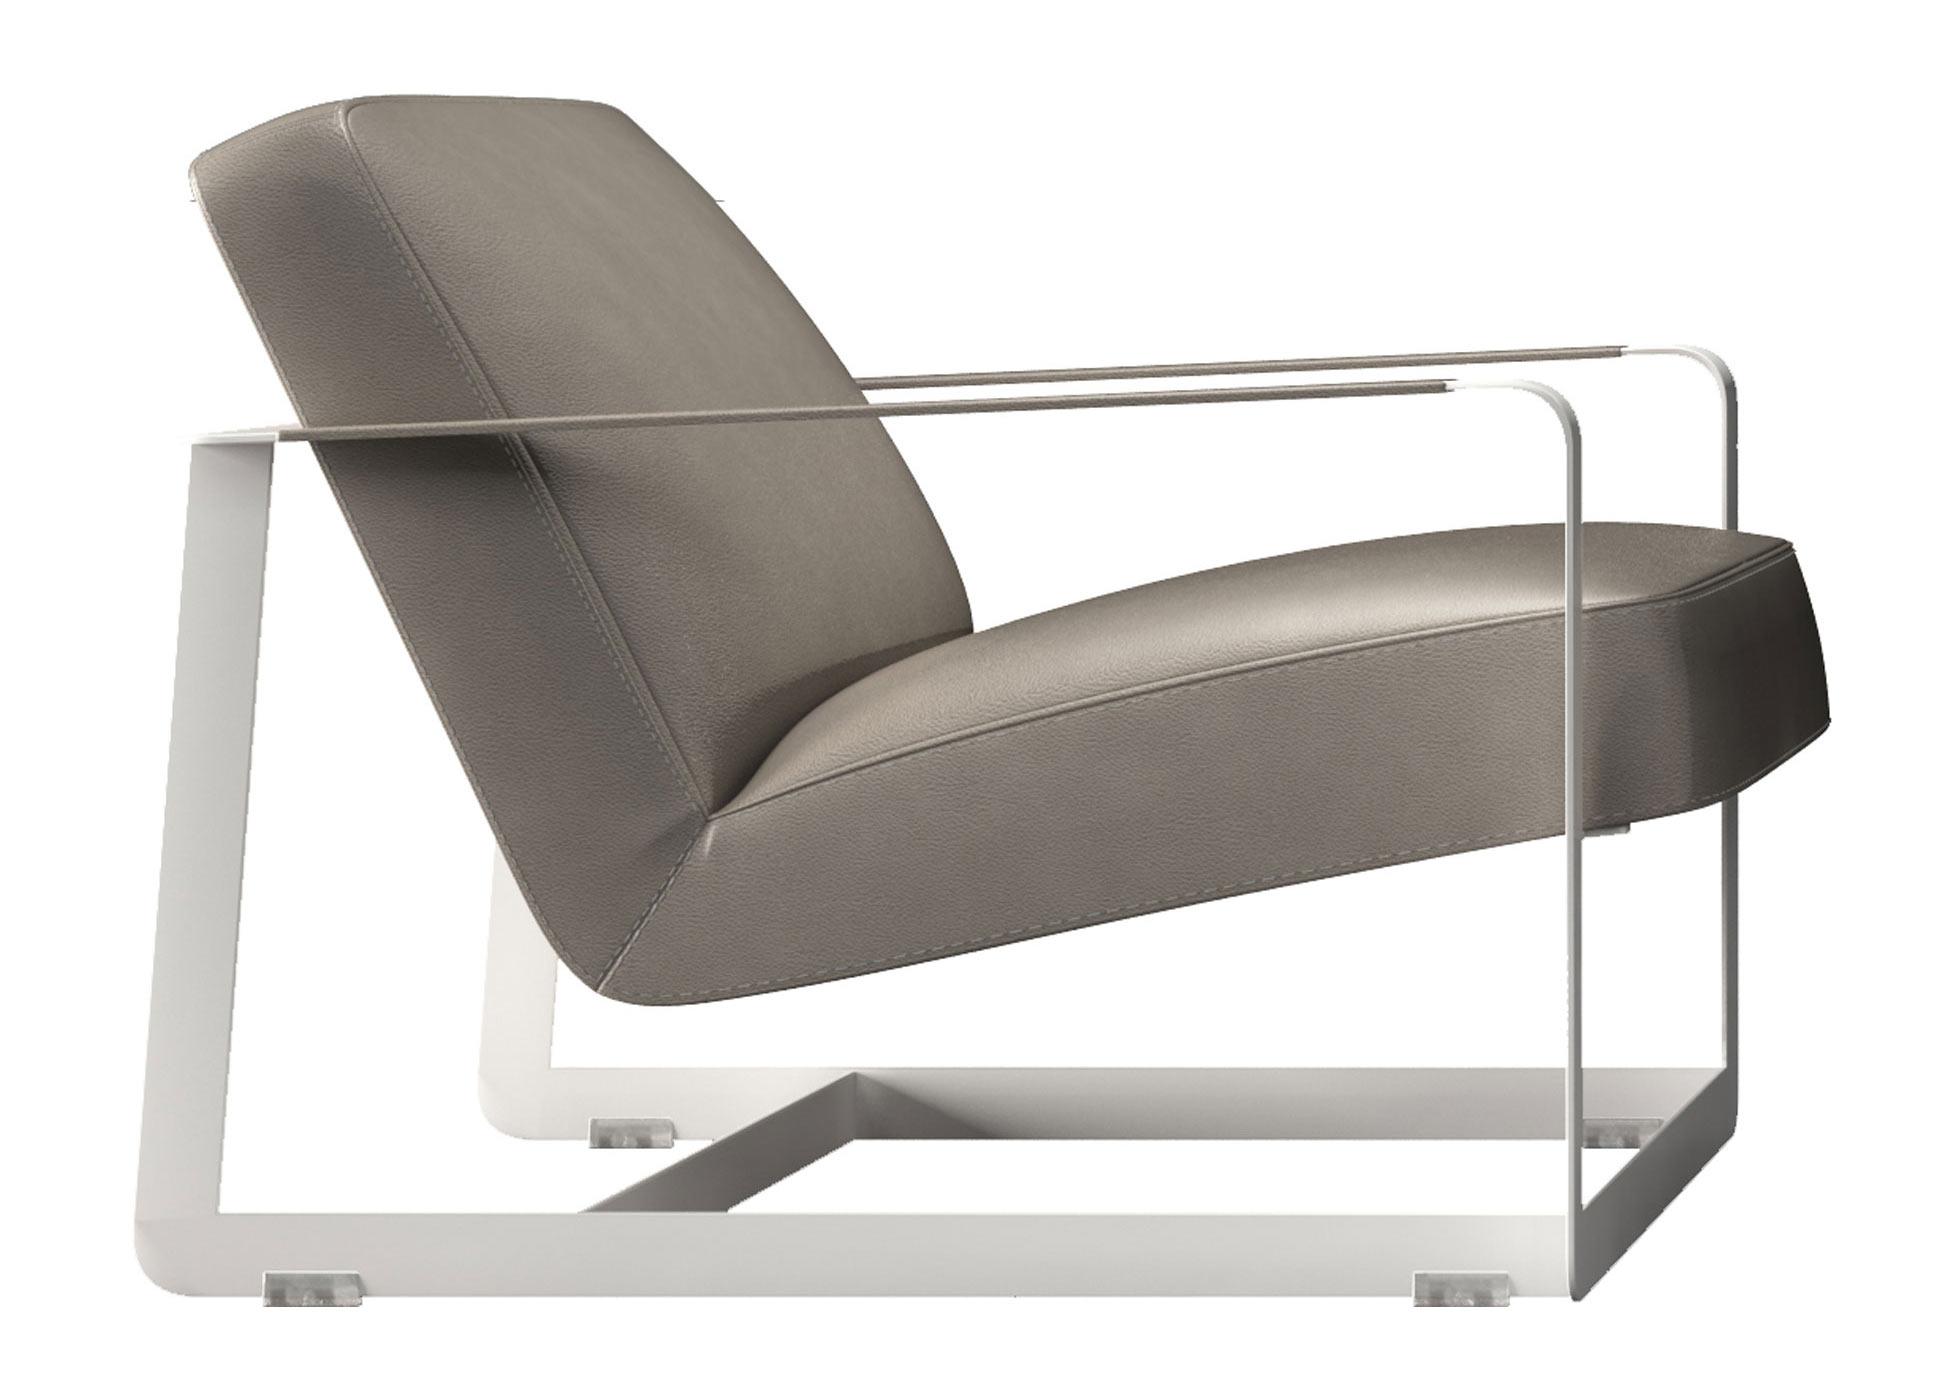 Groovy Crosby Lounge Chair Castle Gray By Modloft Machost Co Dining Chair Design Ideas Machostcouk